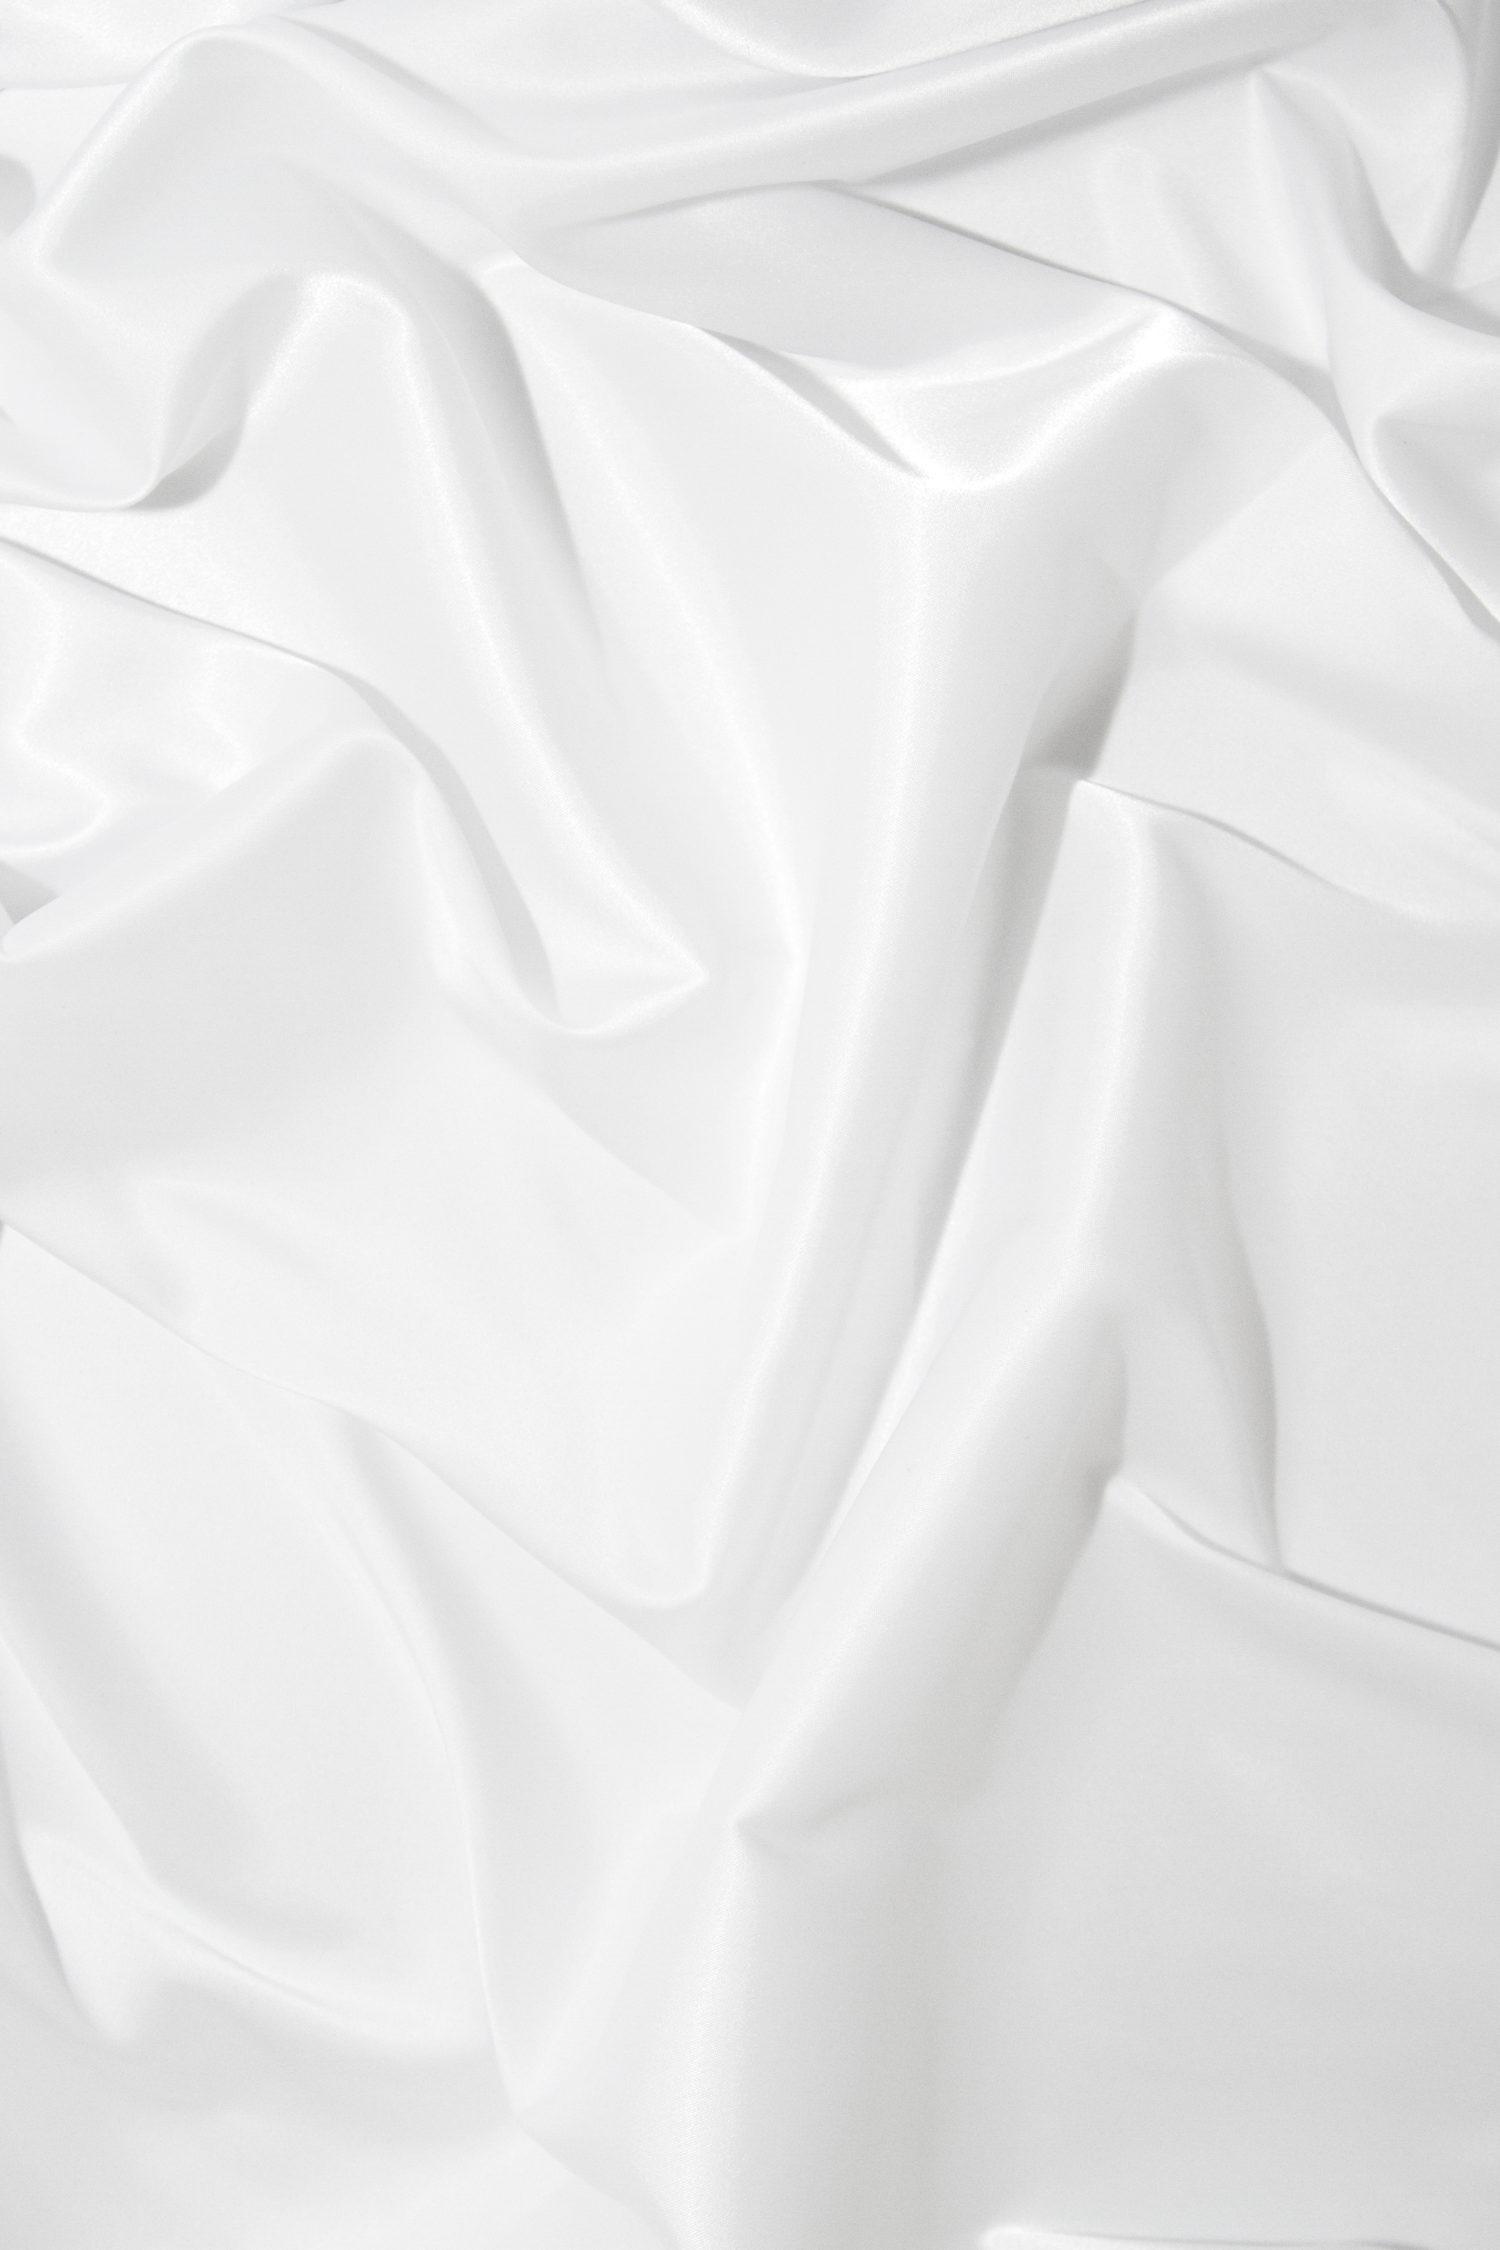 Атлас-стрейч белый глянцевый